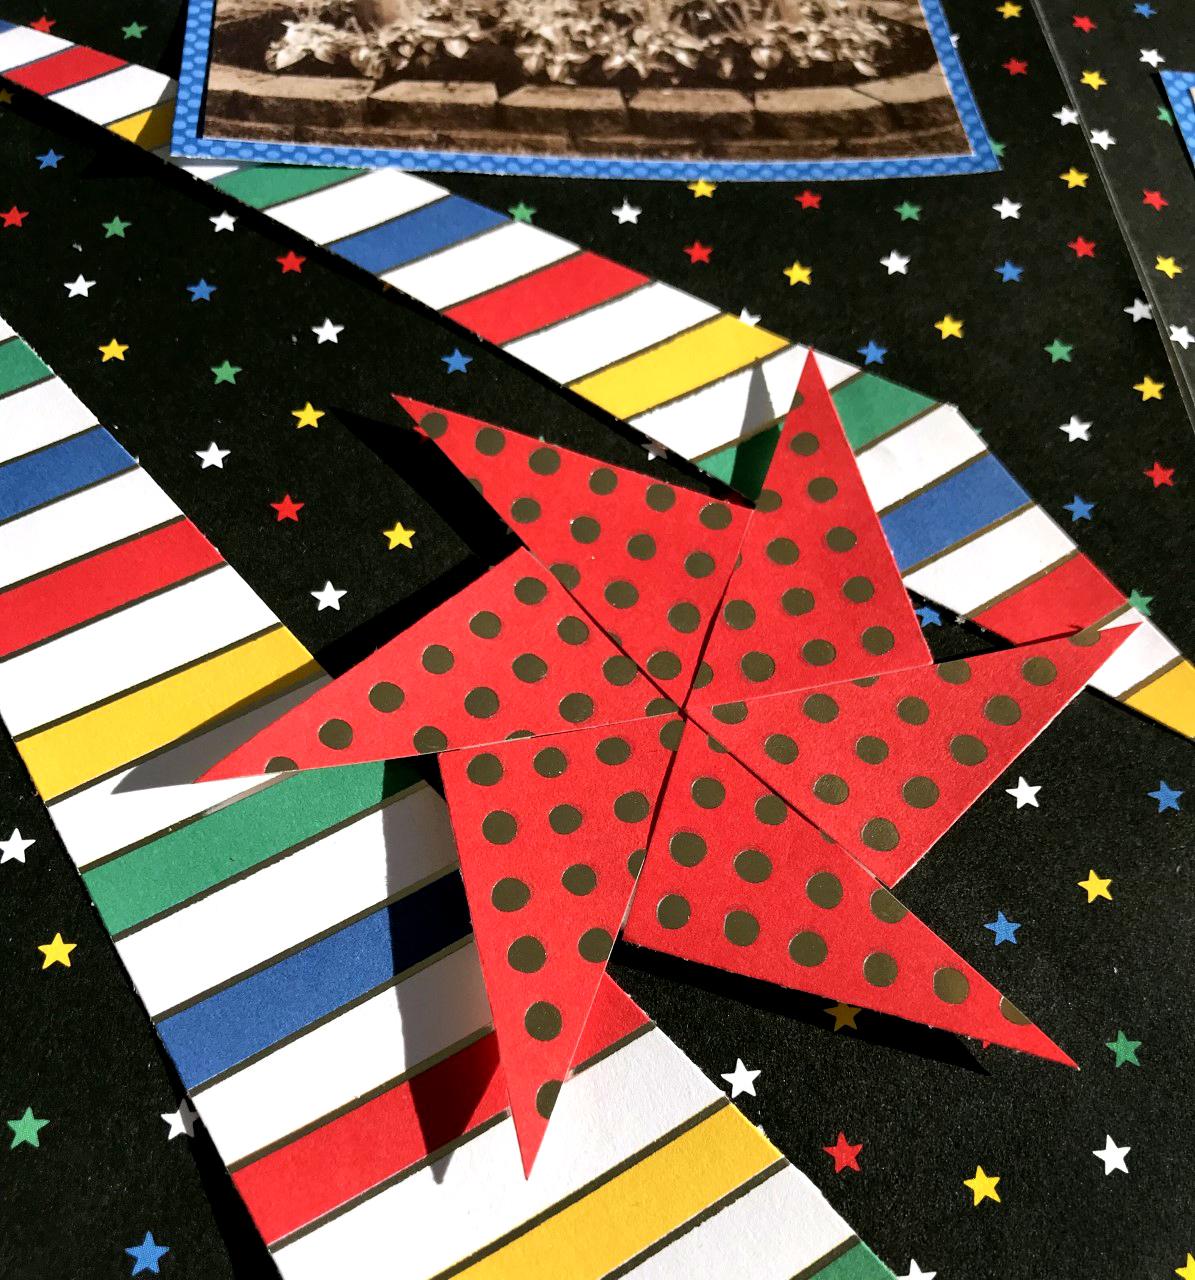 Essentials-Star-Scrapbook-Layout-Process3-Creative-Memories